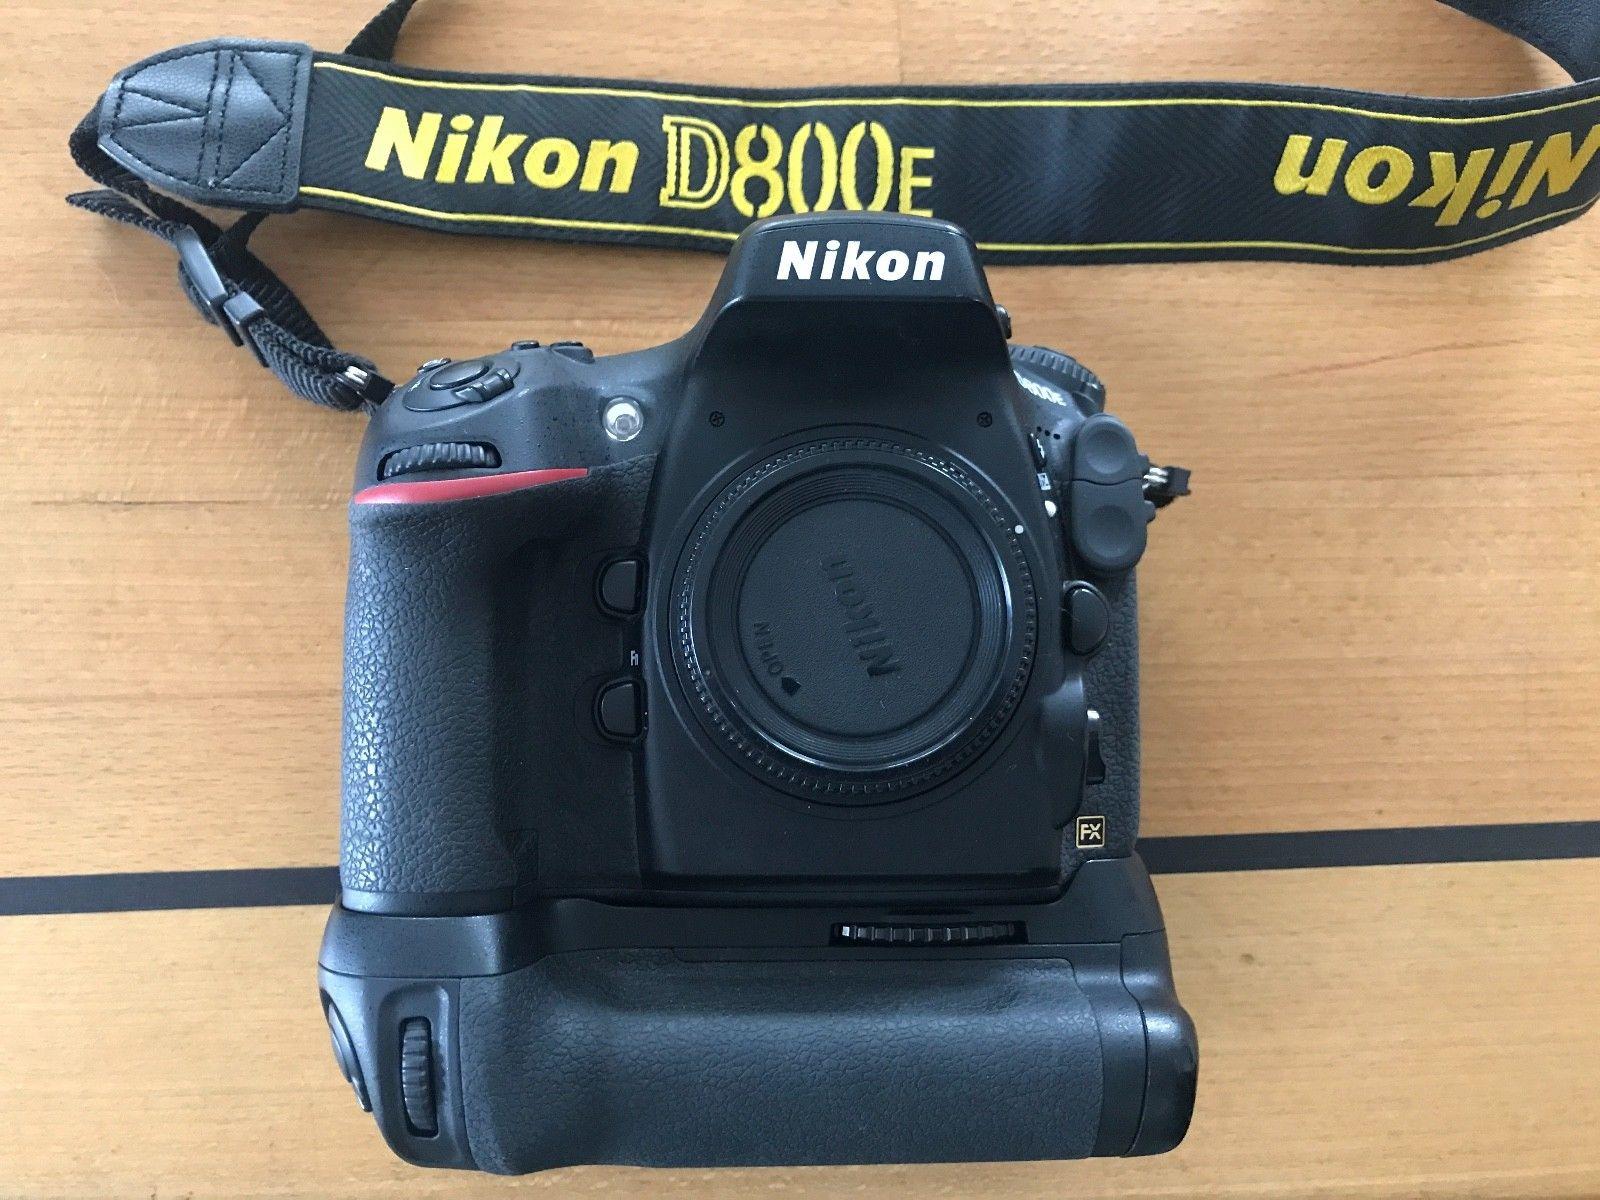 Nikon D D800E 36.3 MP SLR- Digitalkamera mit Motor MB-12 und Rechnung